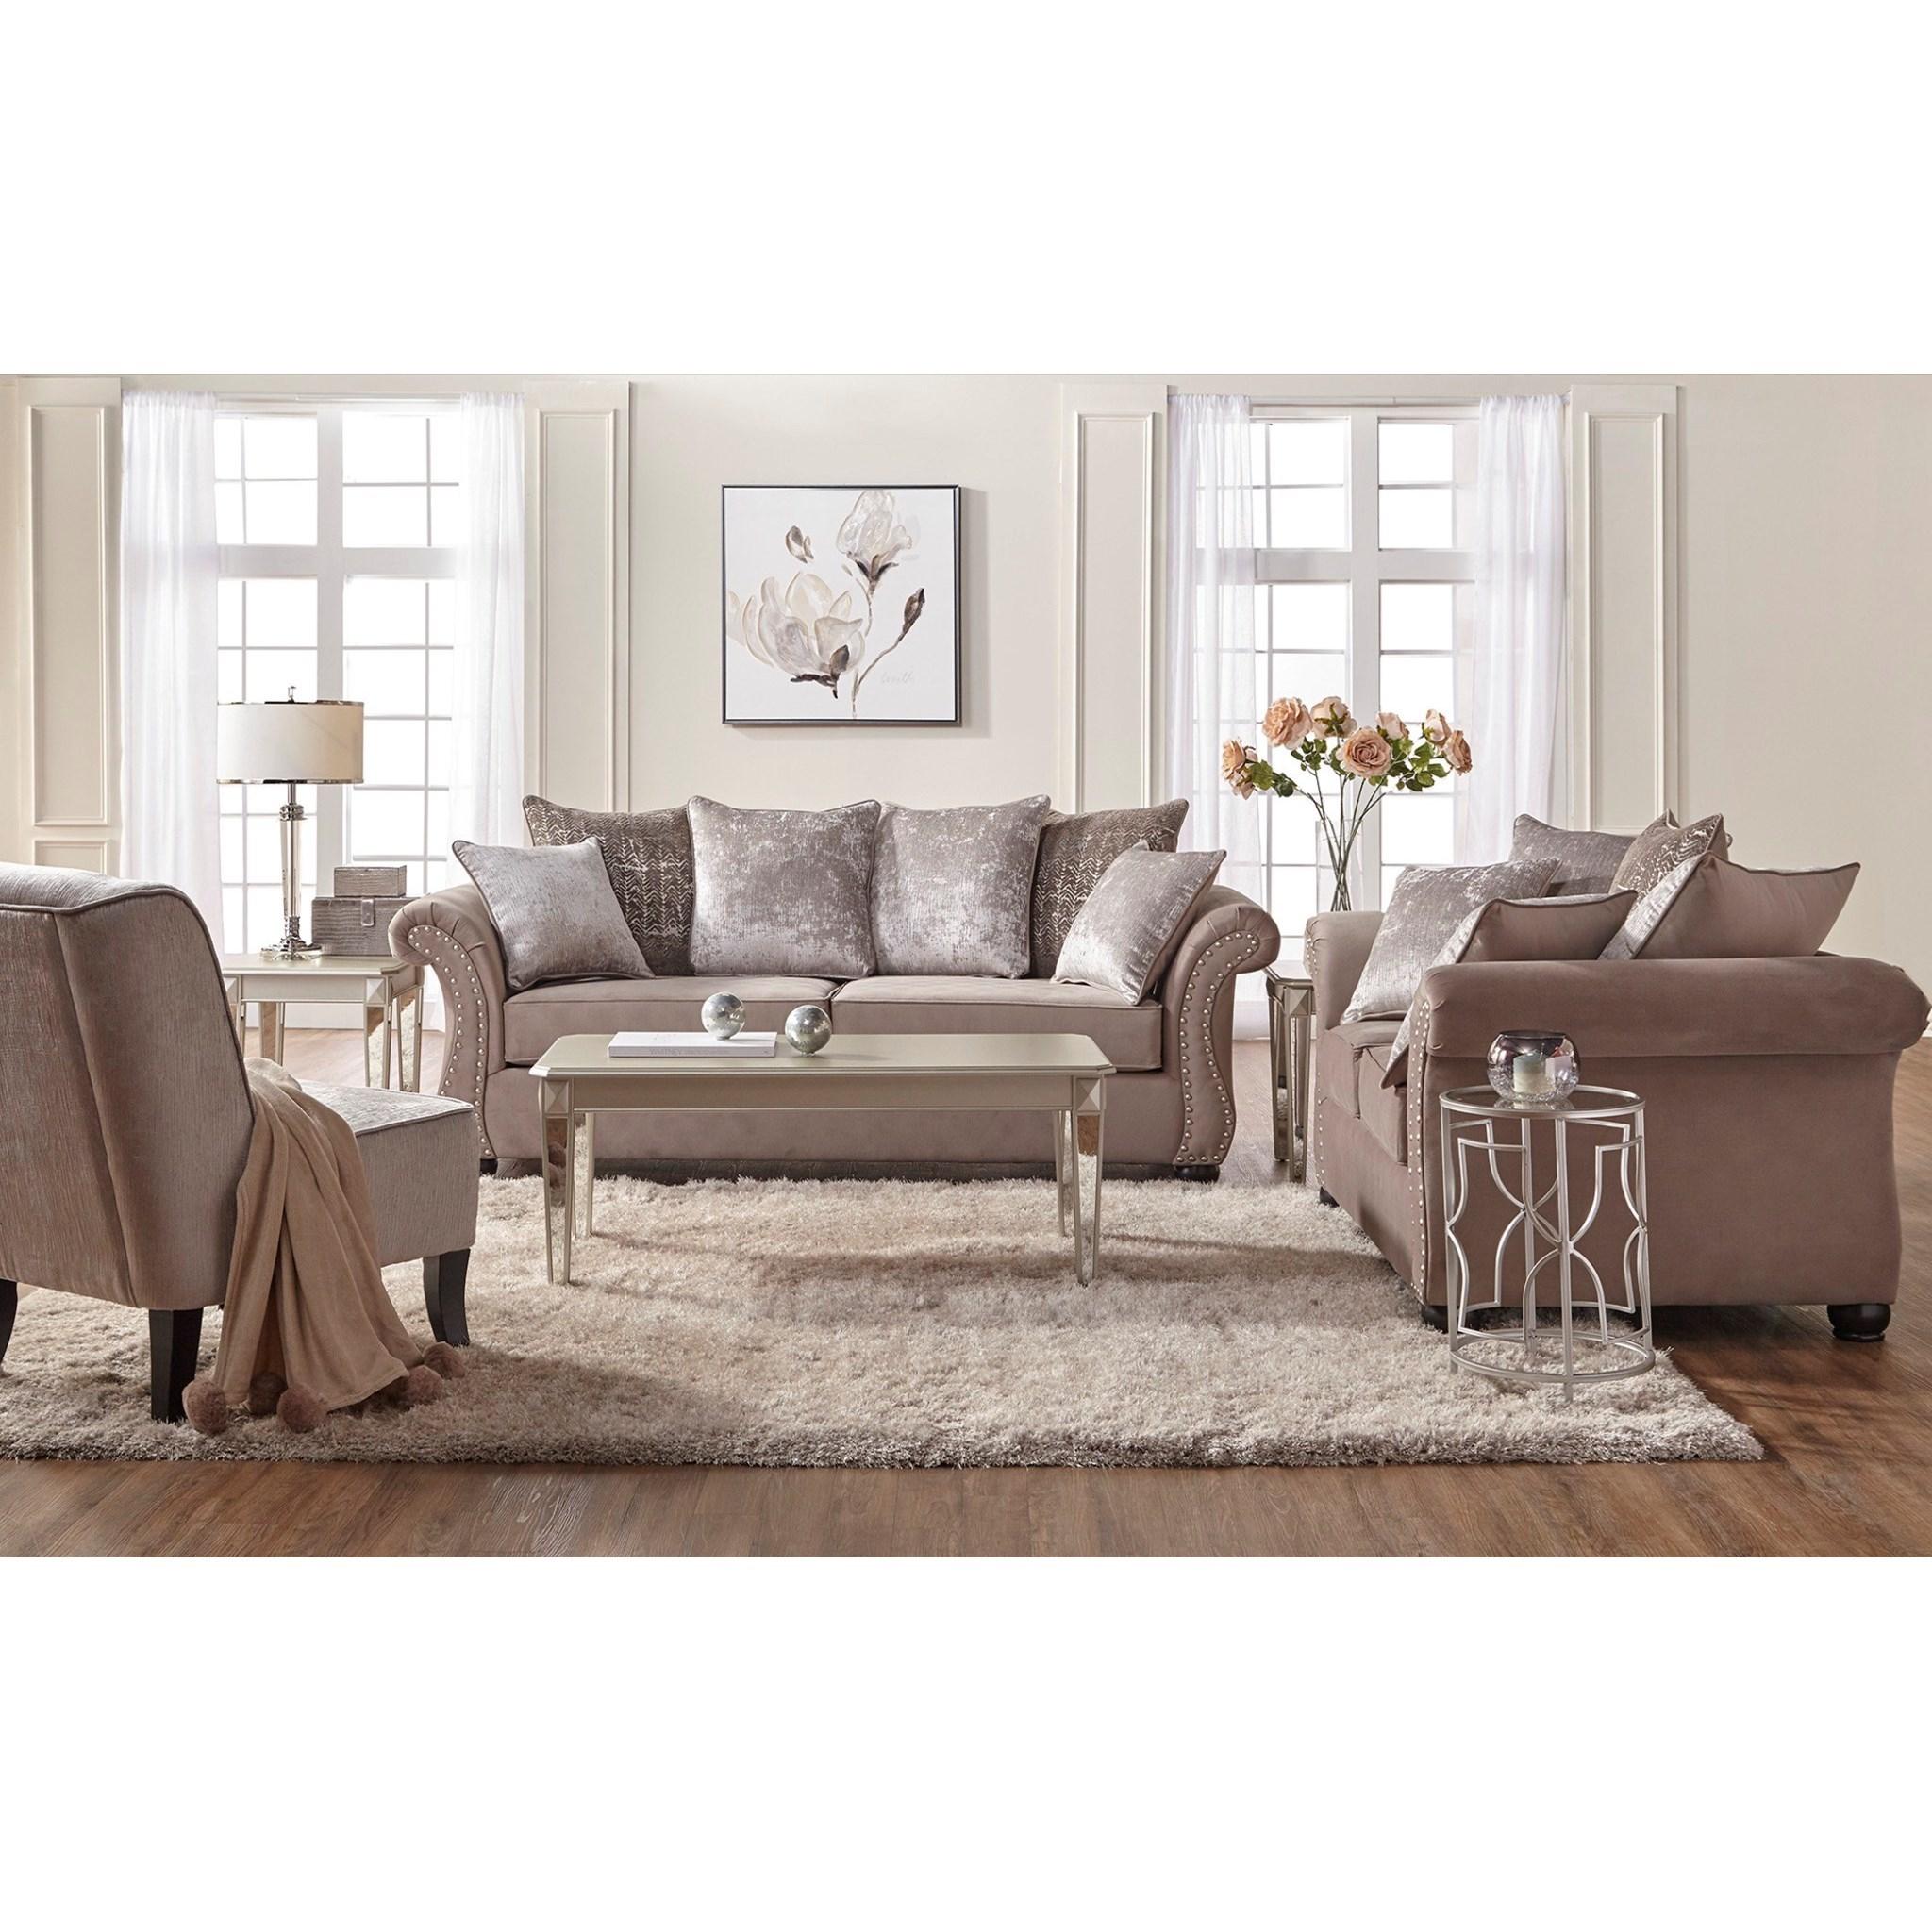 serta upholstery by hughes furniture 7500 stationary living room rh valuecitynj com Serta Upholstery Living Room Collection Serta Upholstery Furniture